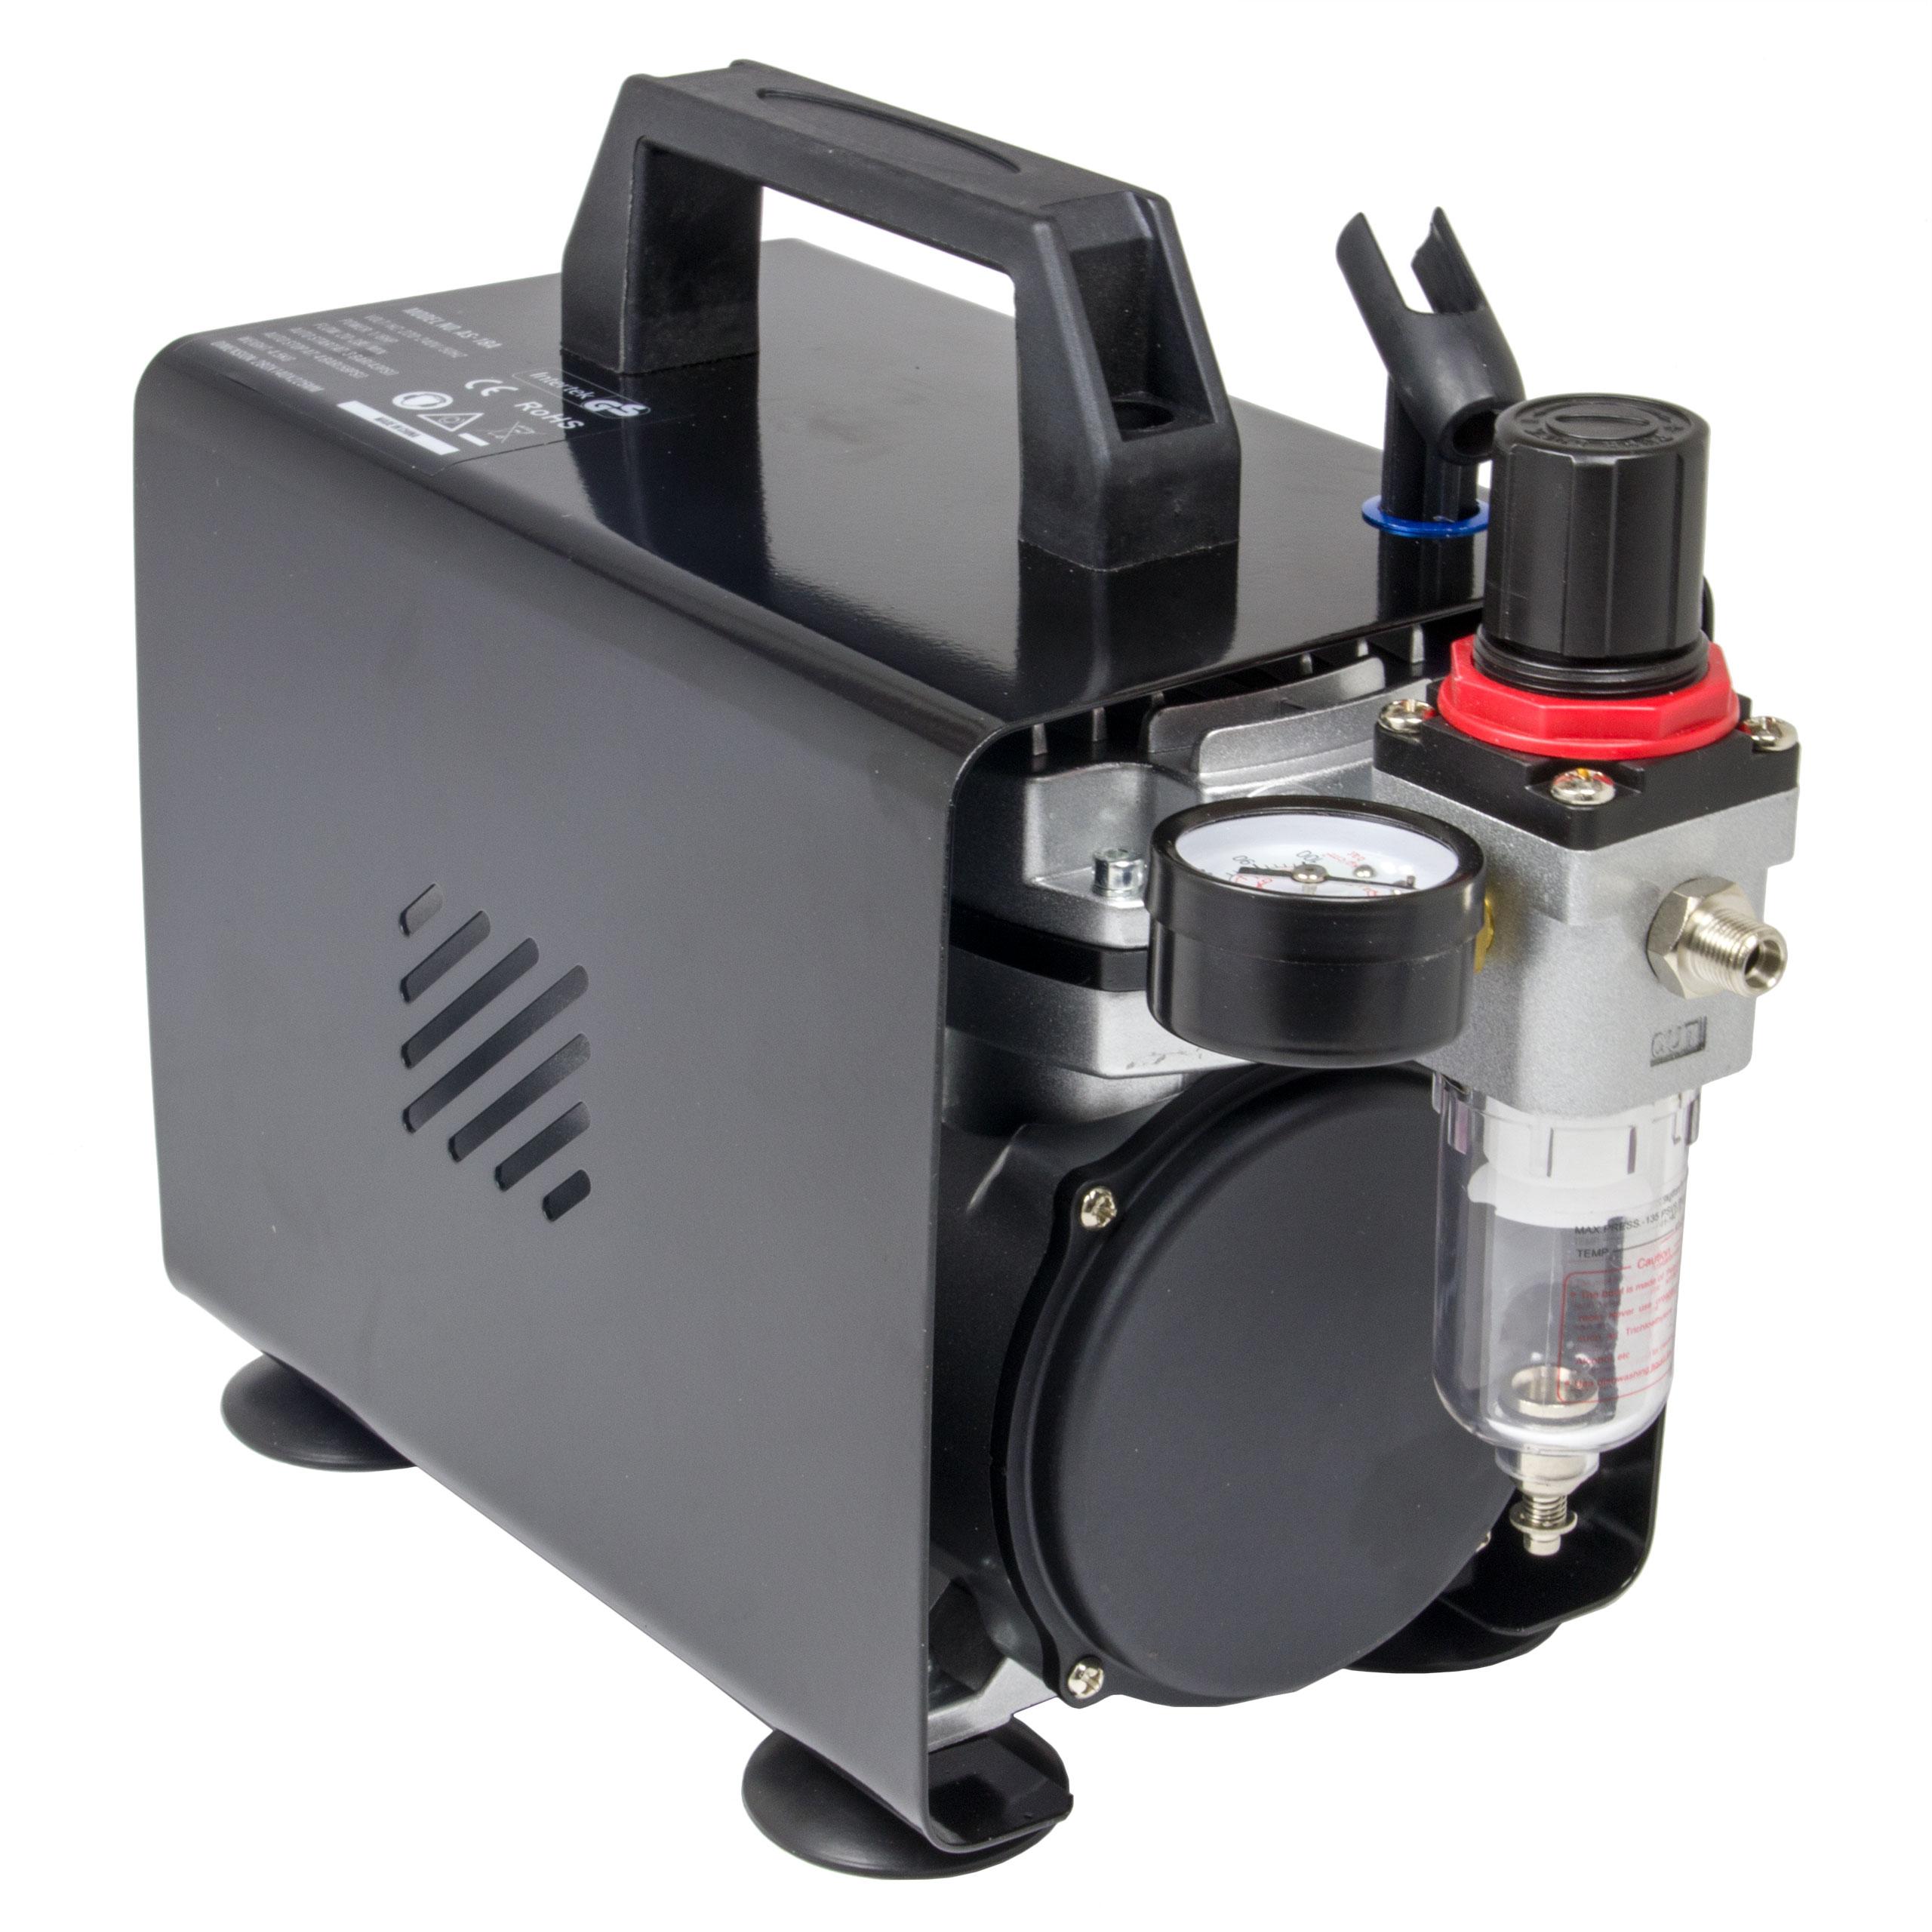 Airbrush Kompressor Saturn AS18B / AS18A kompakt mit Manometer und Druckminderer